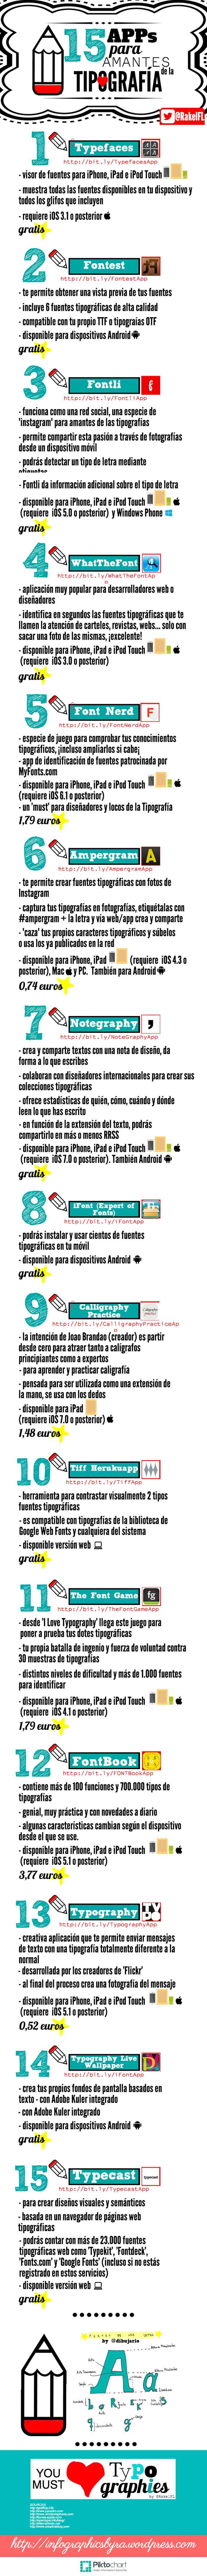 Infografia sobre 15 aplicaciones para amantes de la tipografia